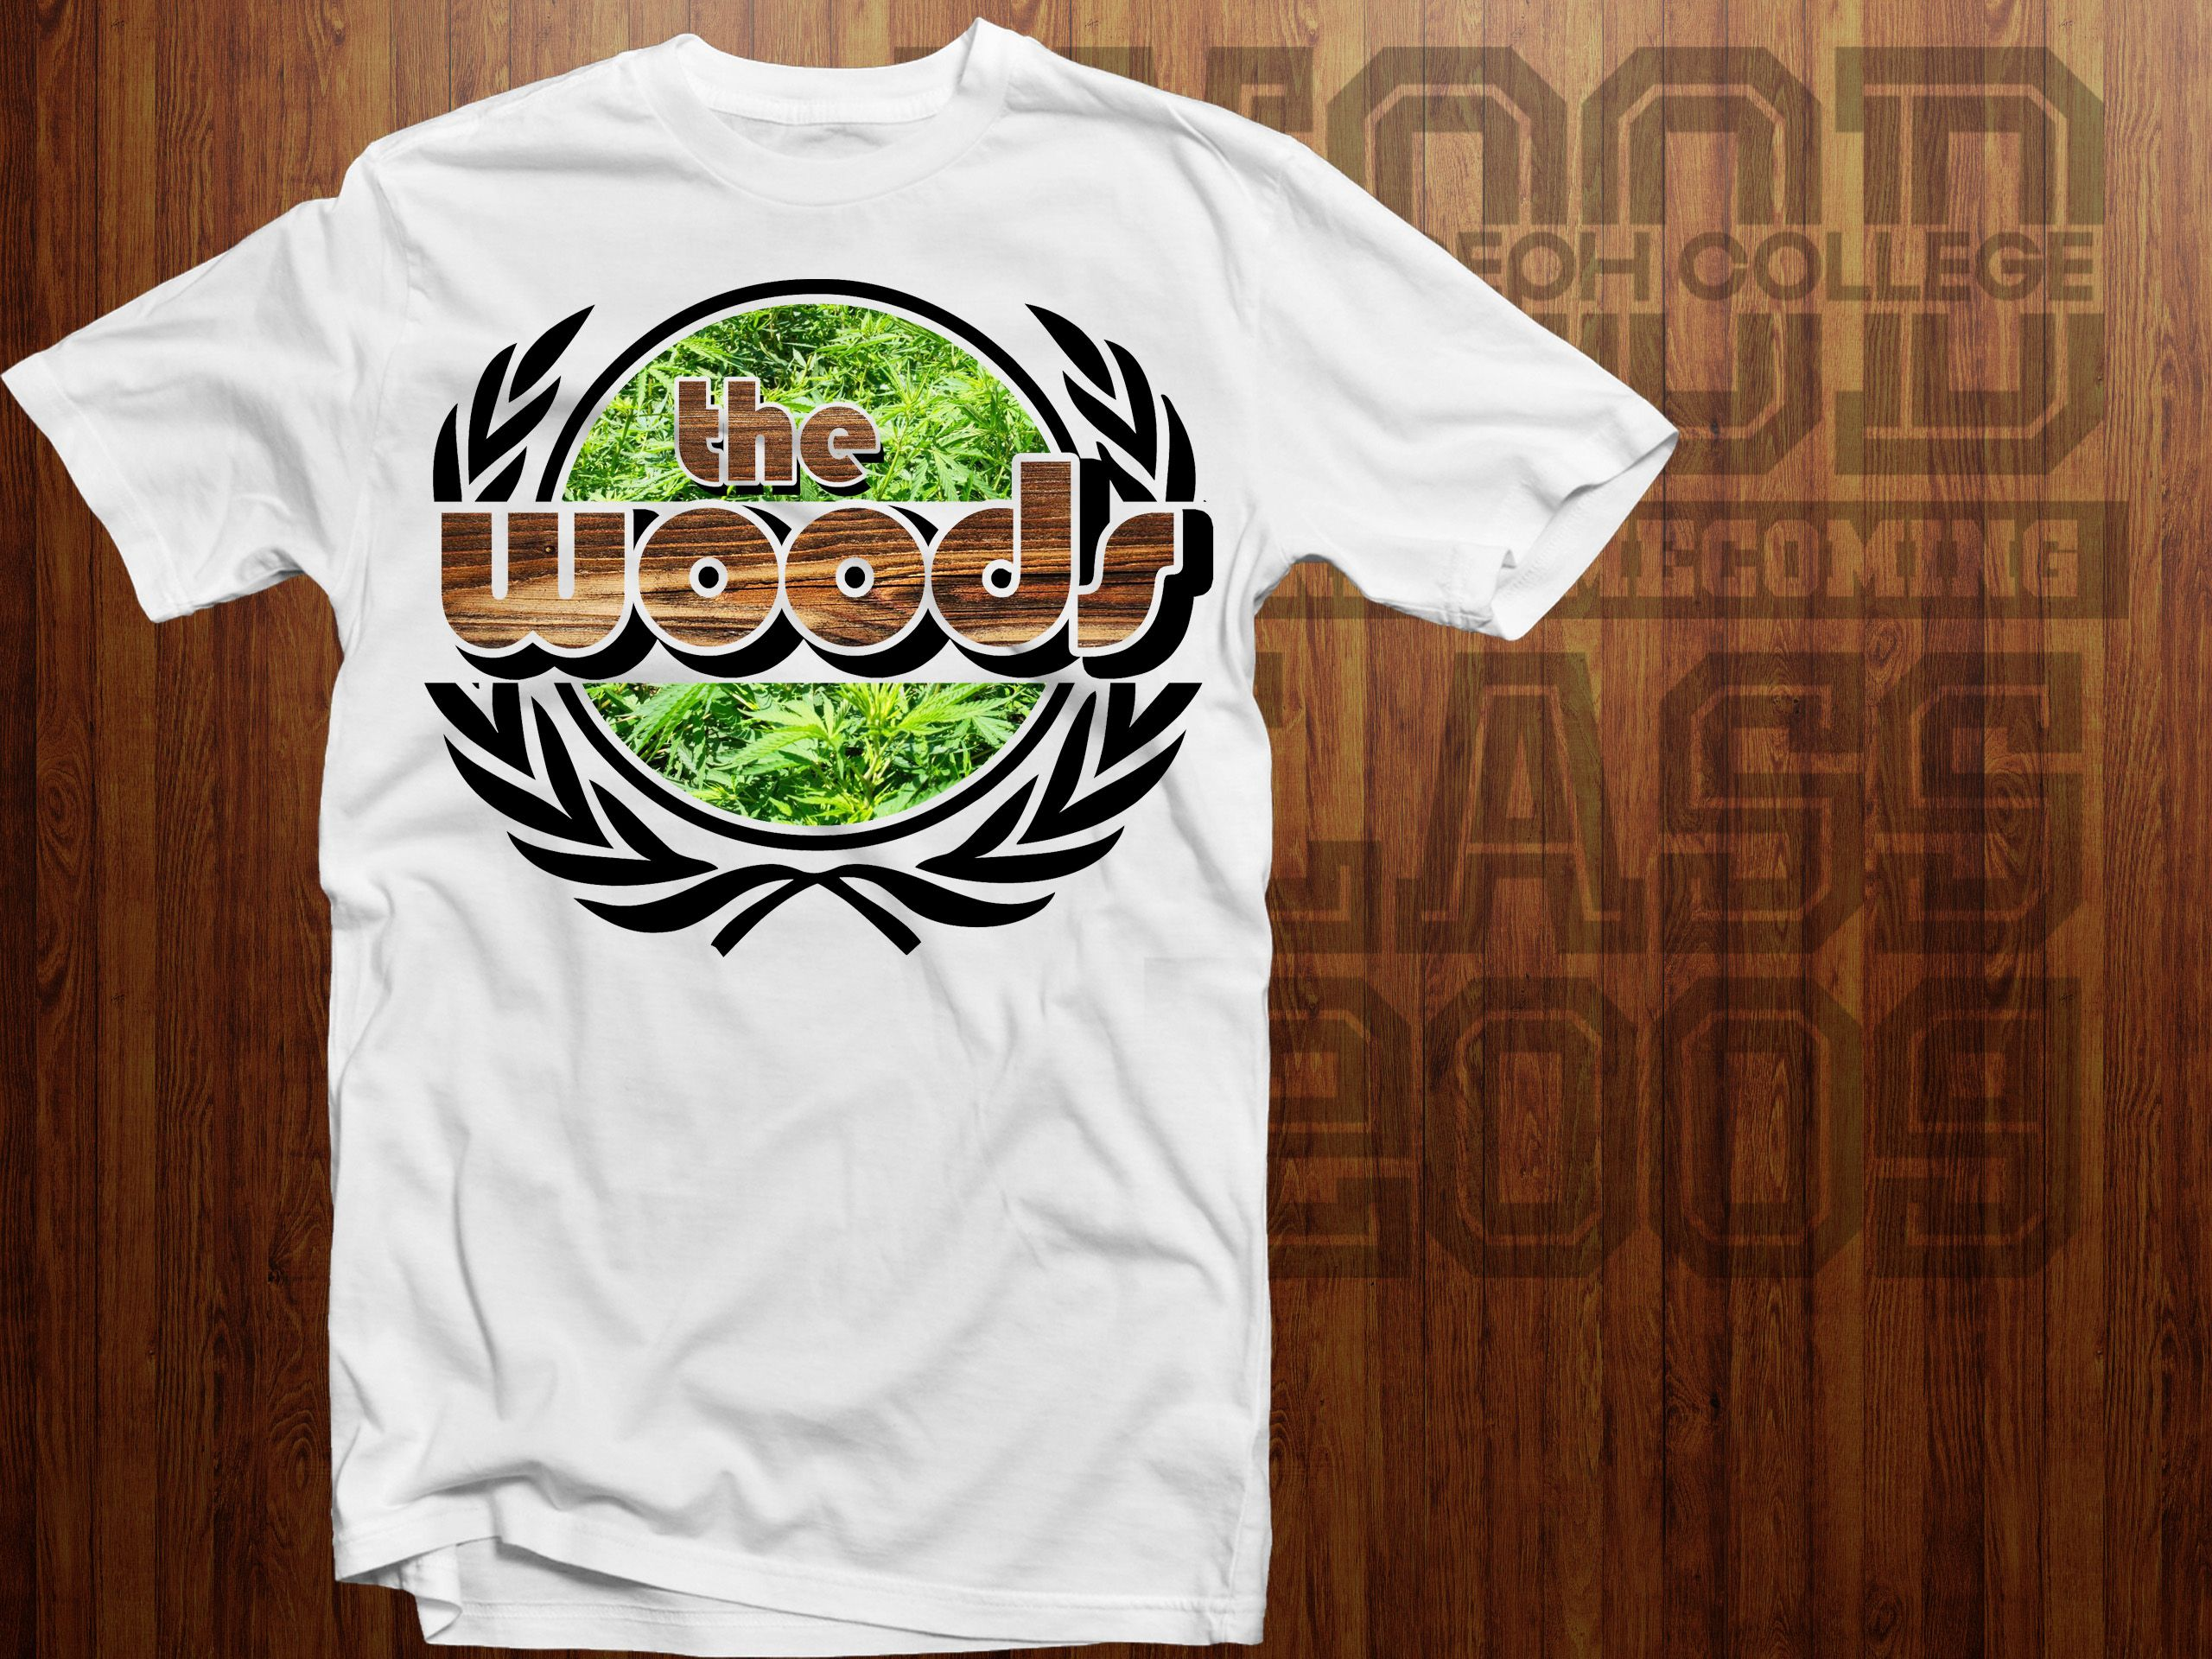 Shirt design for alumni homecoming - Alumni Homecoming Batch 09 Wood First 5 Years Shirt Design